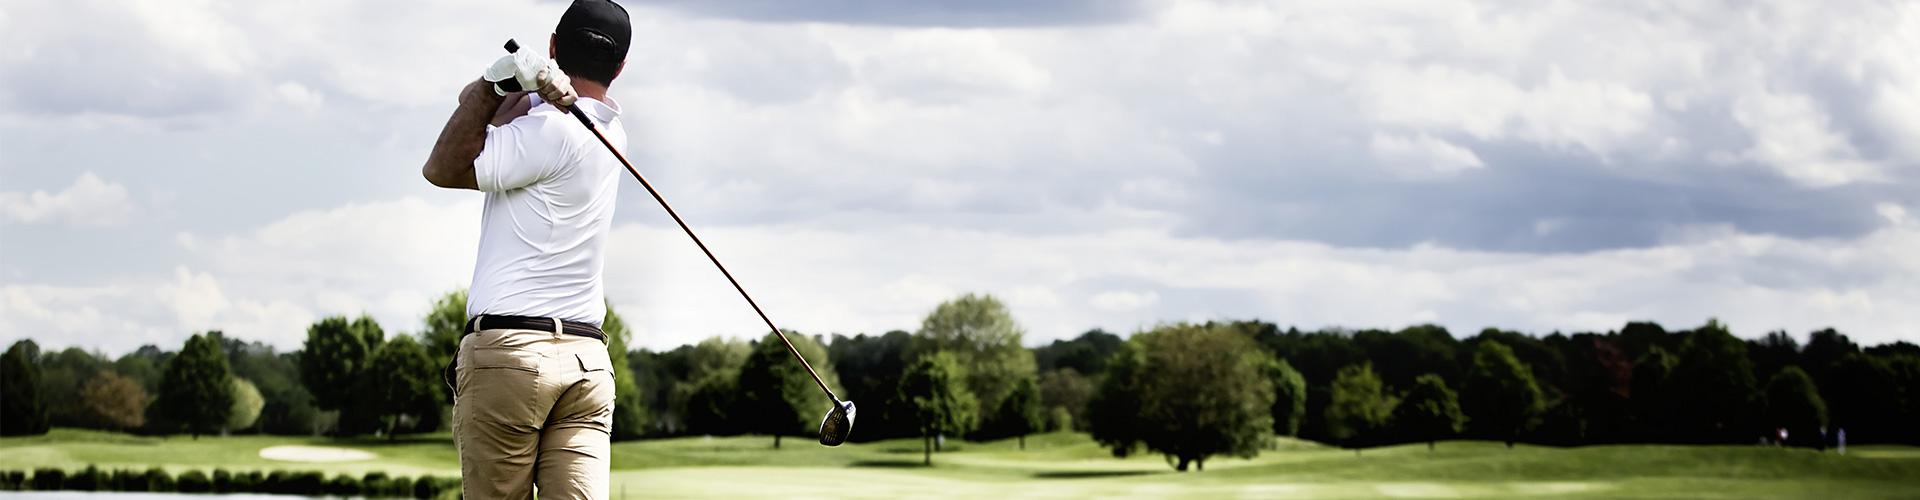 Golf-Court